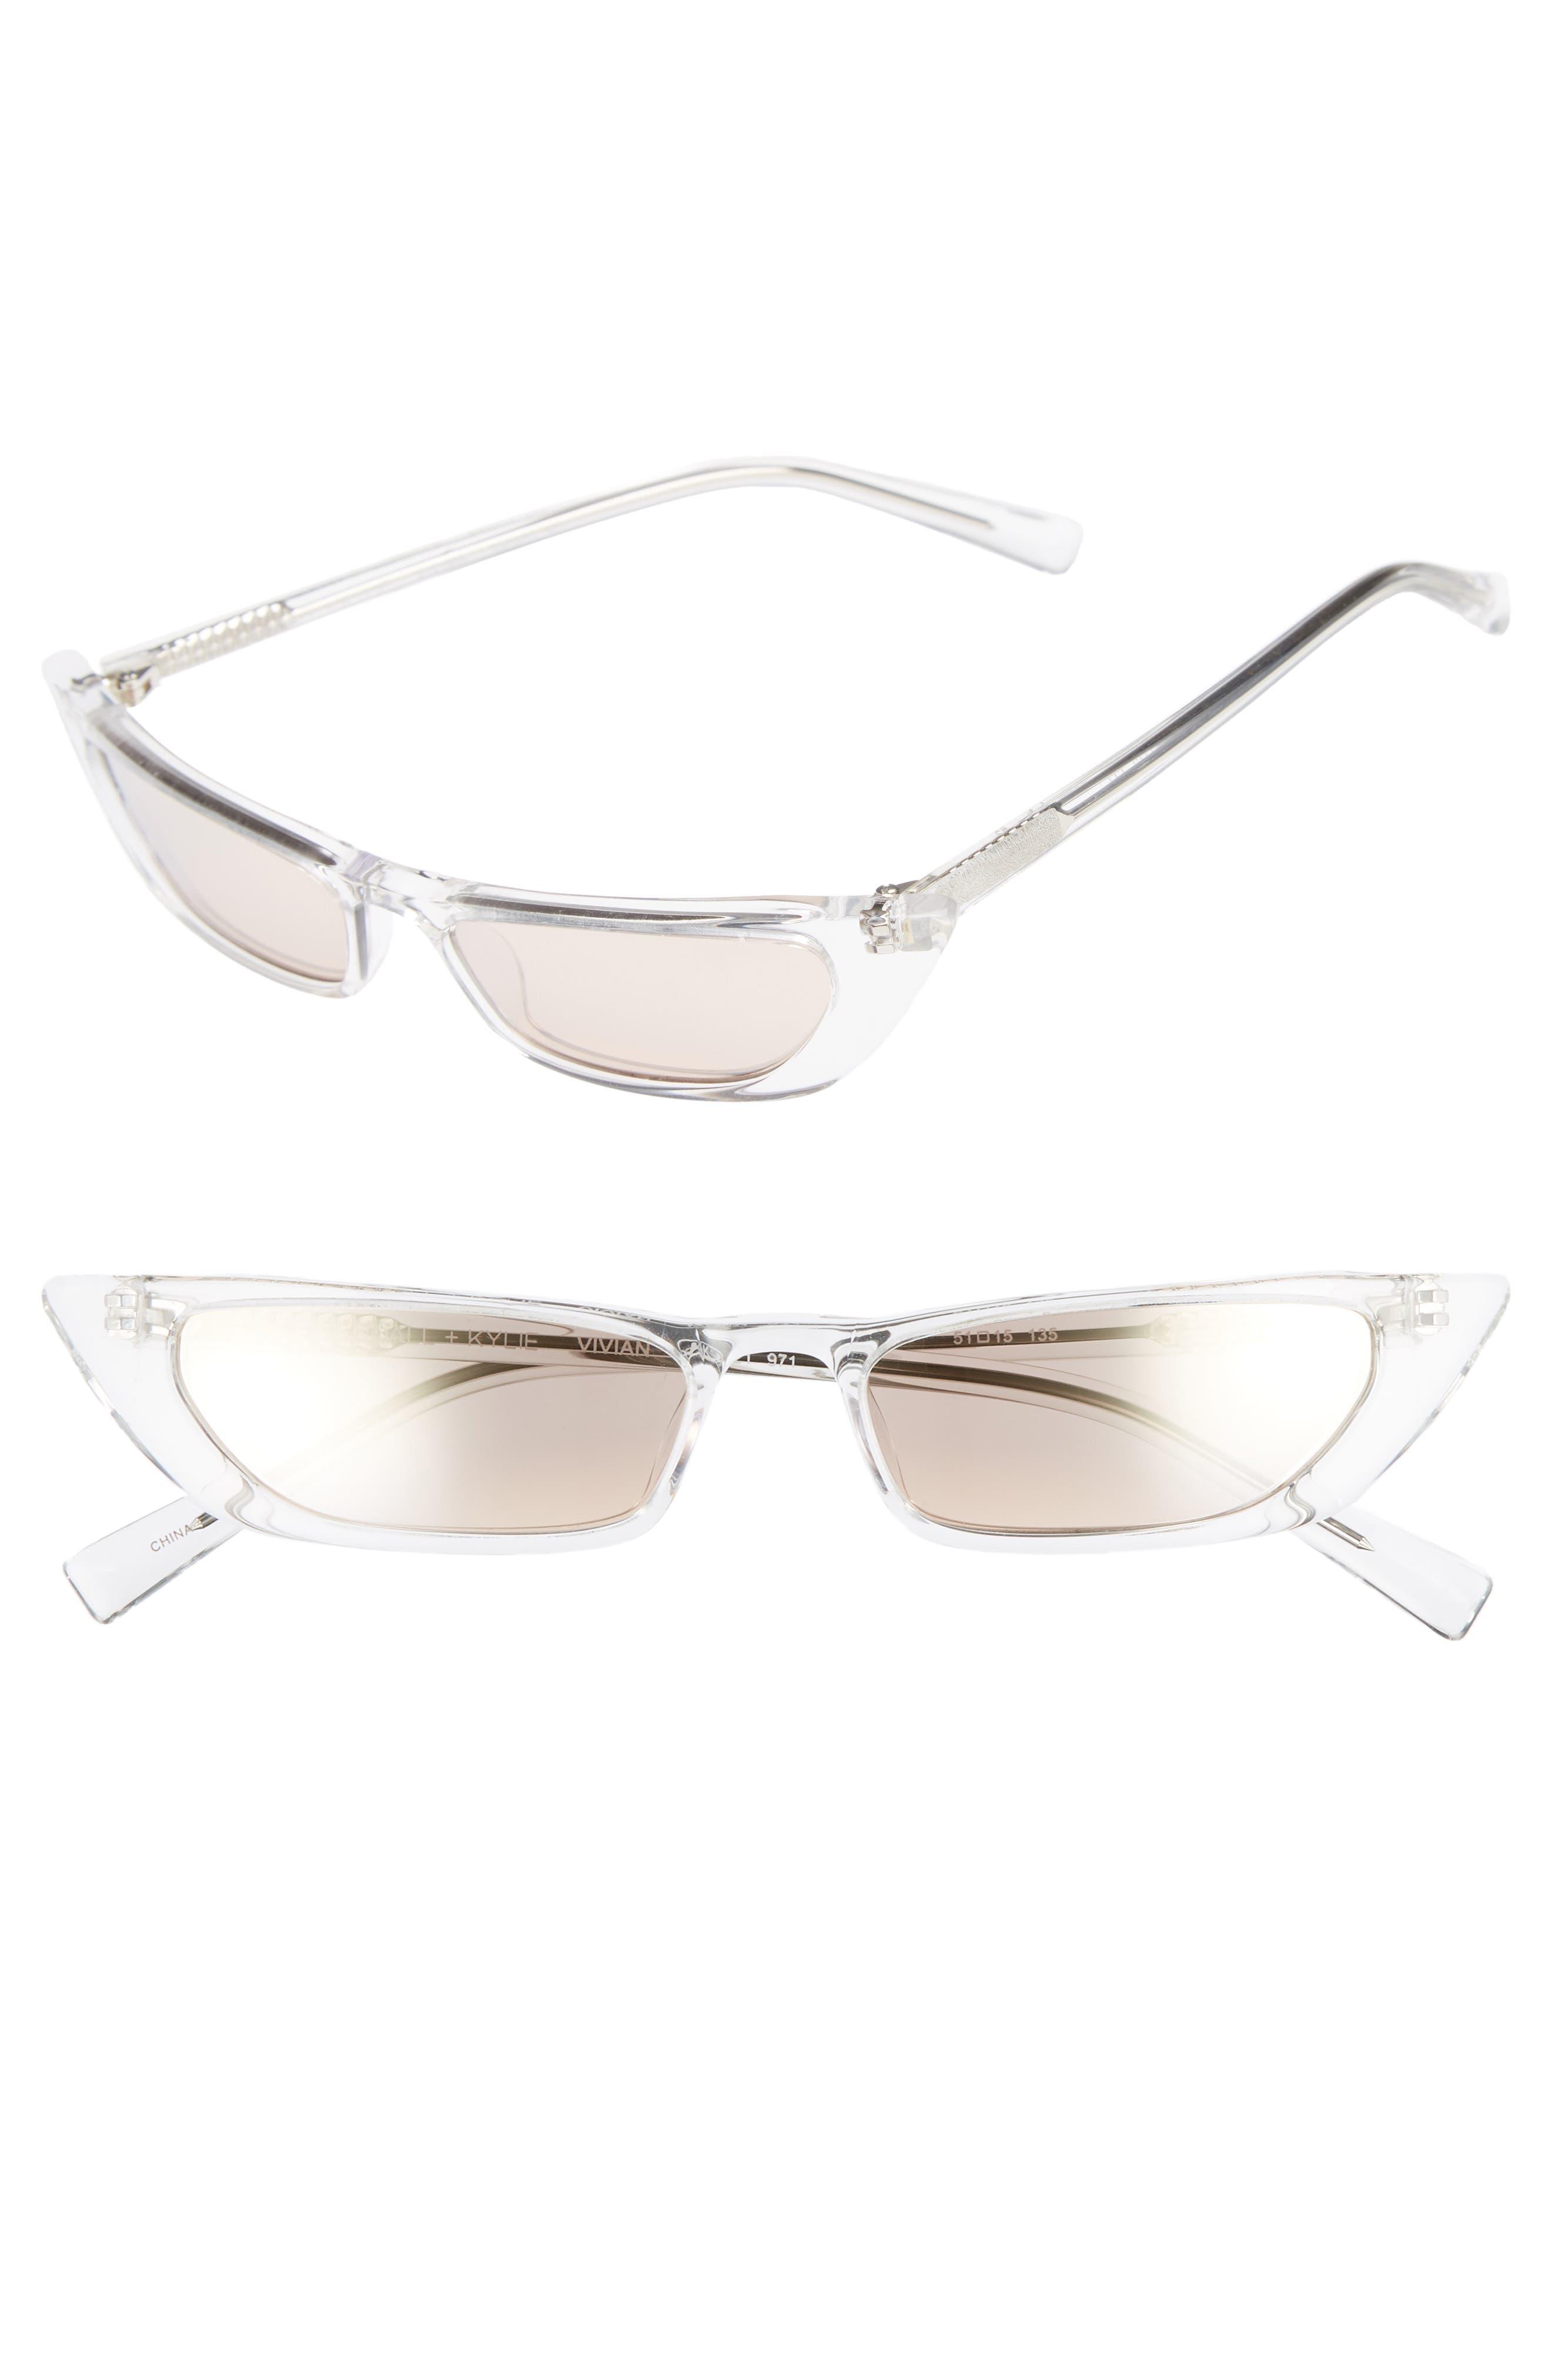 KENDALL + KYLIE,                             Vivian Extreme 51mm Cat Eye Sunglasses,                             Main thumbnail 1, color,                             106